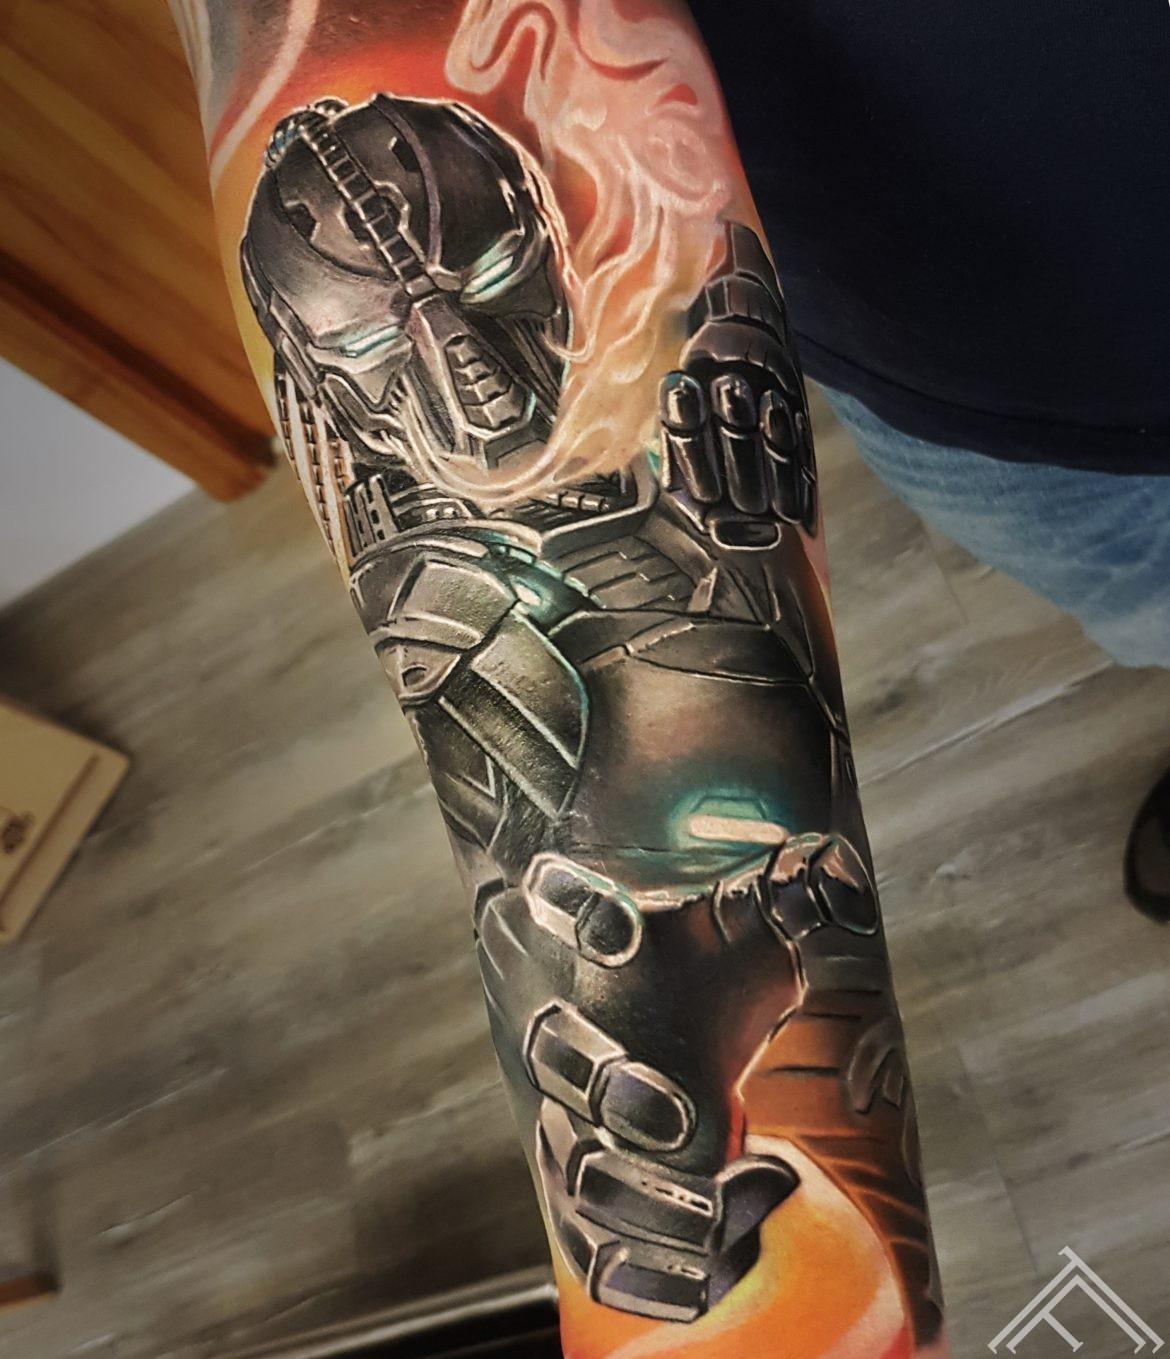 smoke-mortalkombat-tattoo-fight-game-tetovejums-sporta2-marispavlo-facebook-instagram-triborg